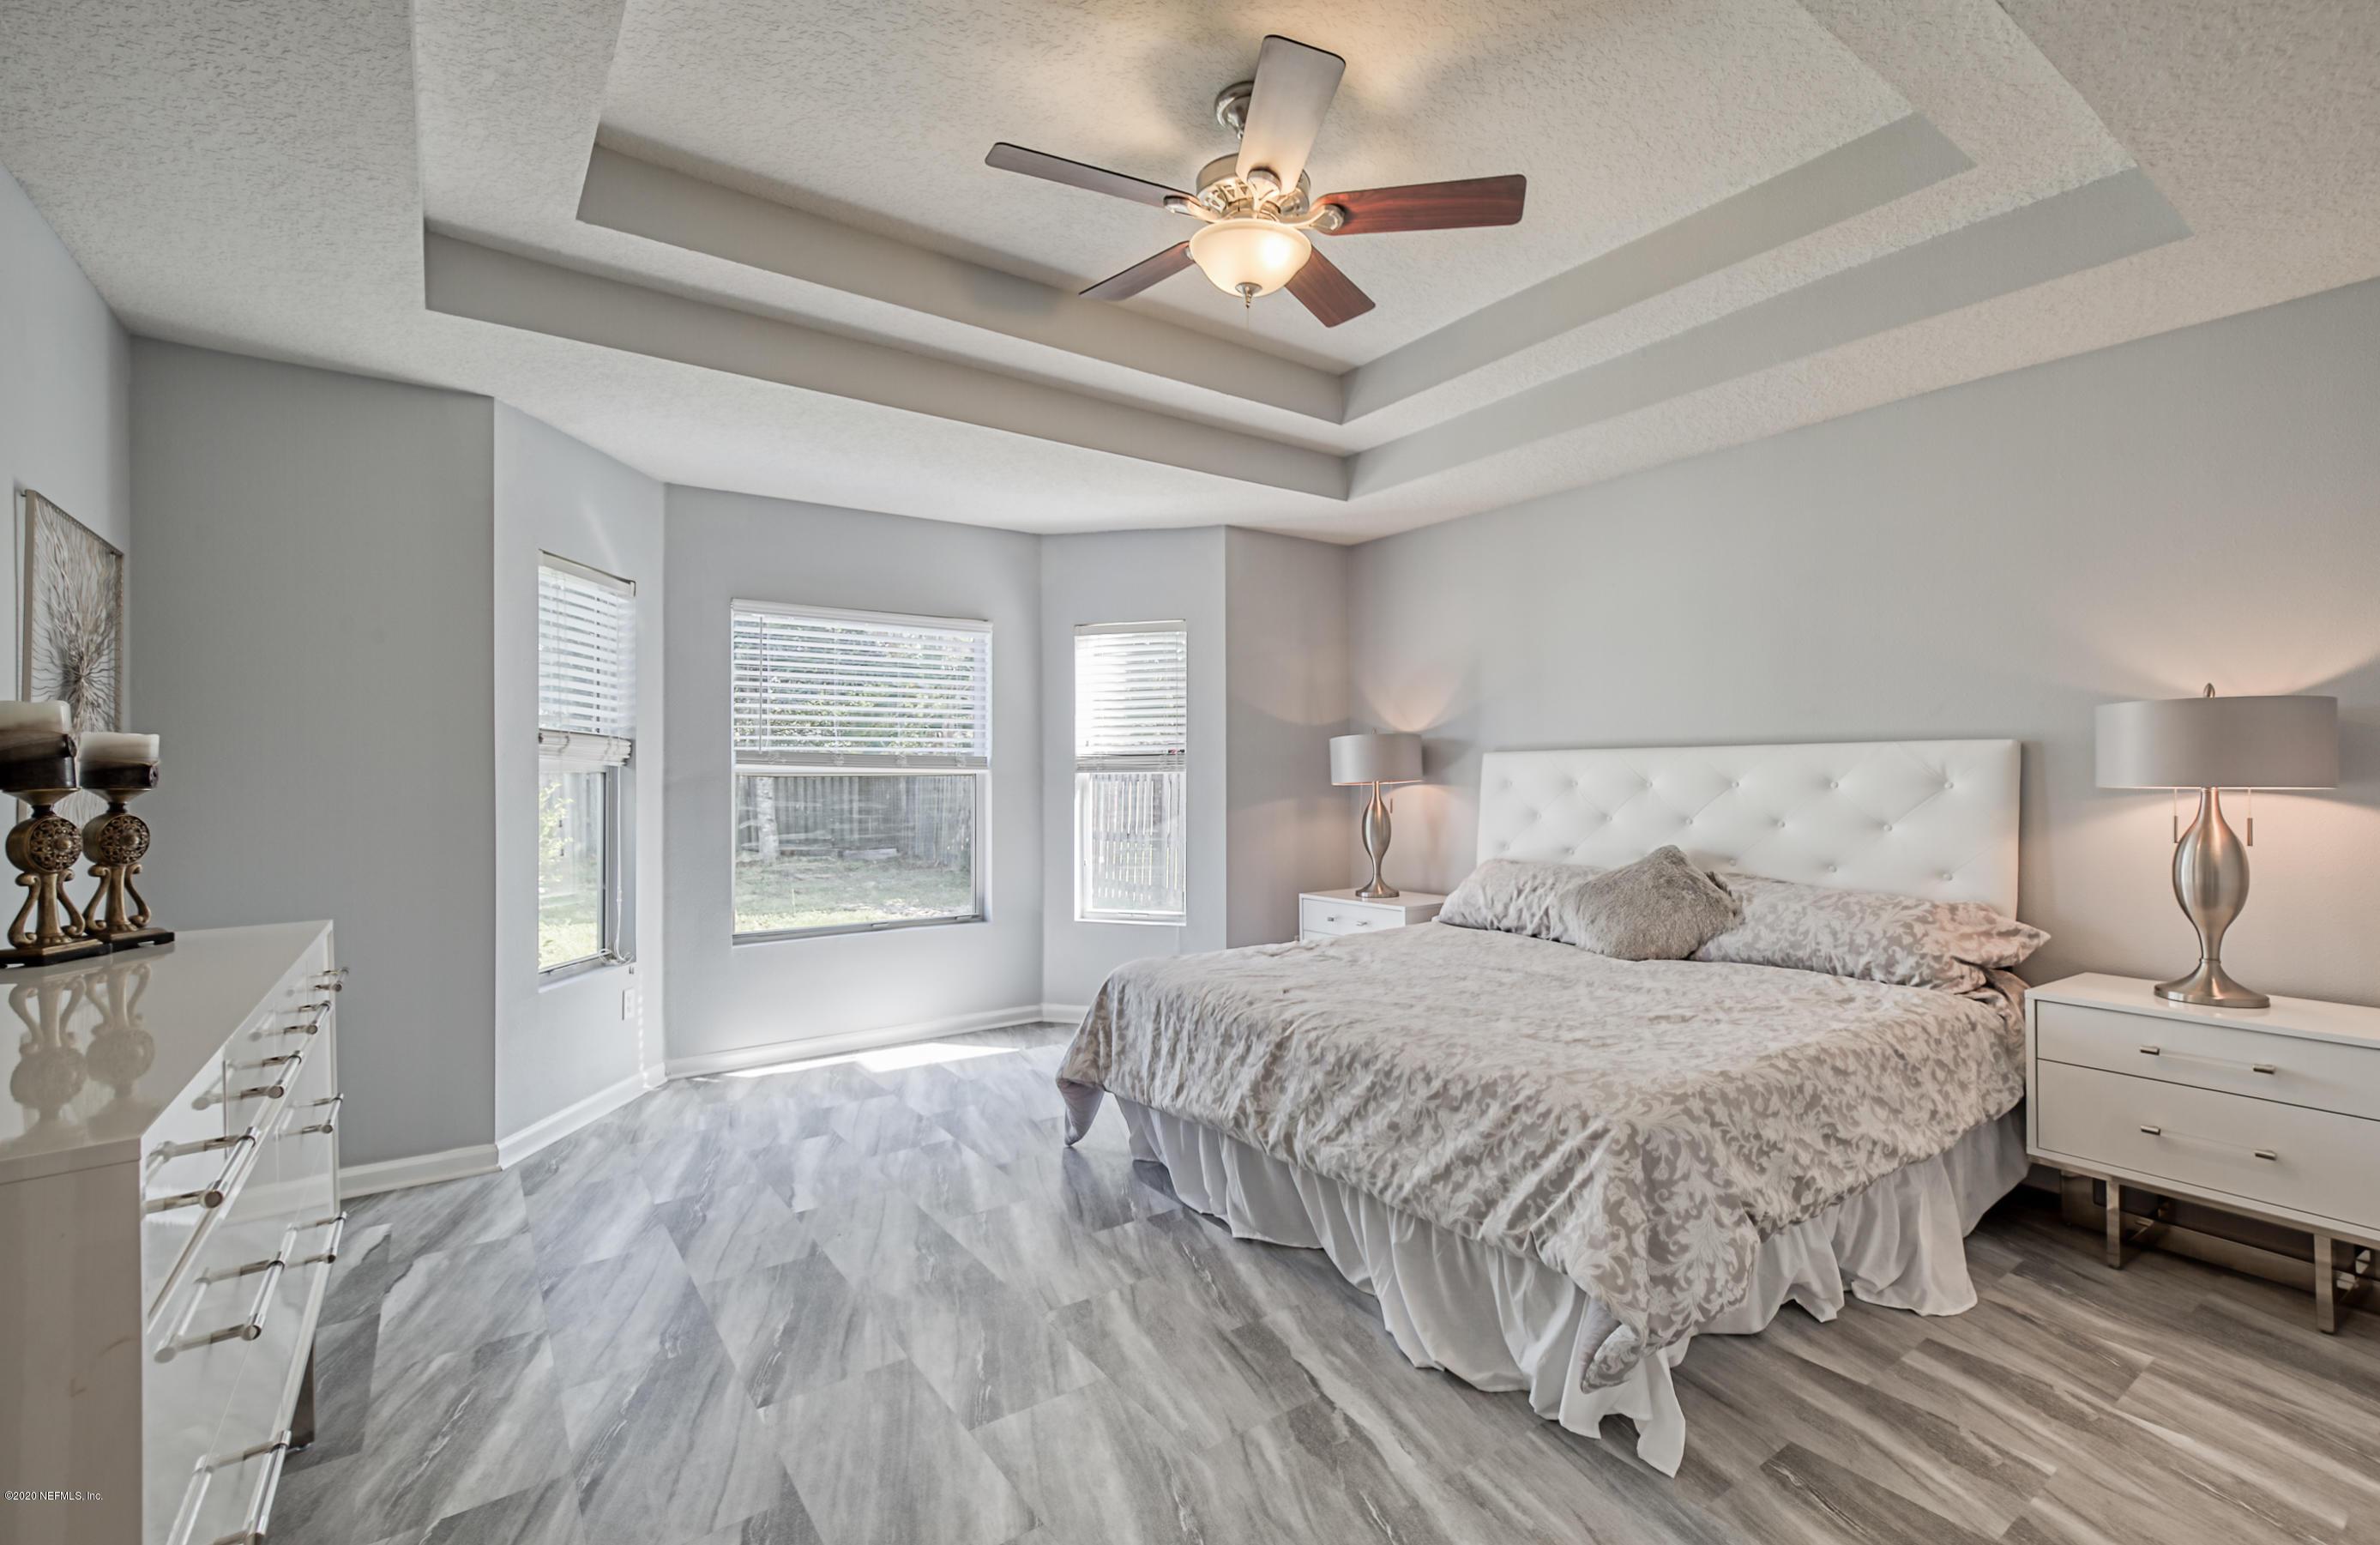 437 FORT DRUM, ST AUGUSTINE, FLORIDA 32092, 5 Bedrooms Bedrooms, ,3 BathroomsBathrooms,Residential,For sale,FORT DRUM,1053450